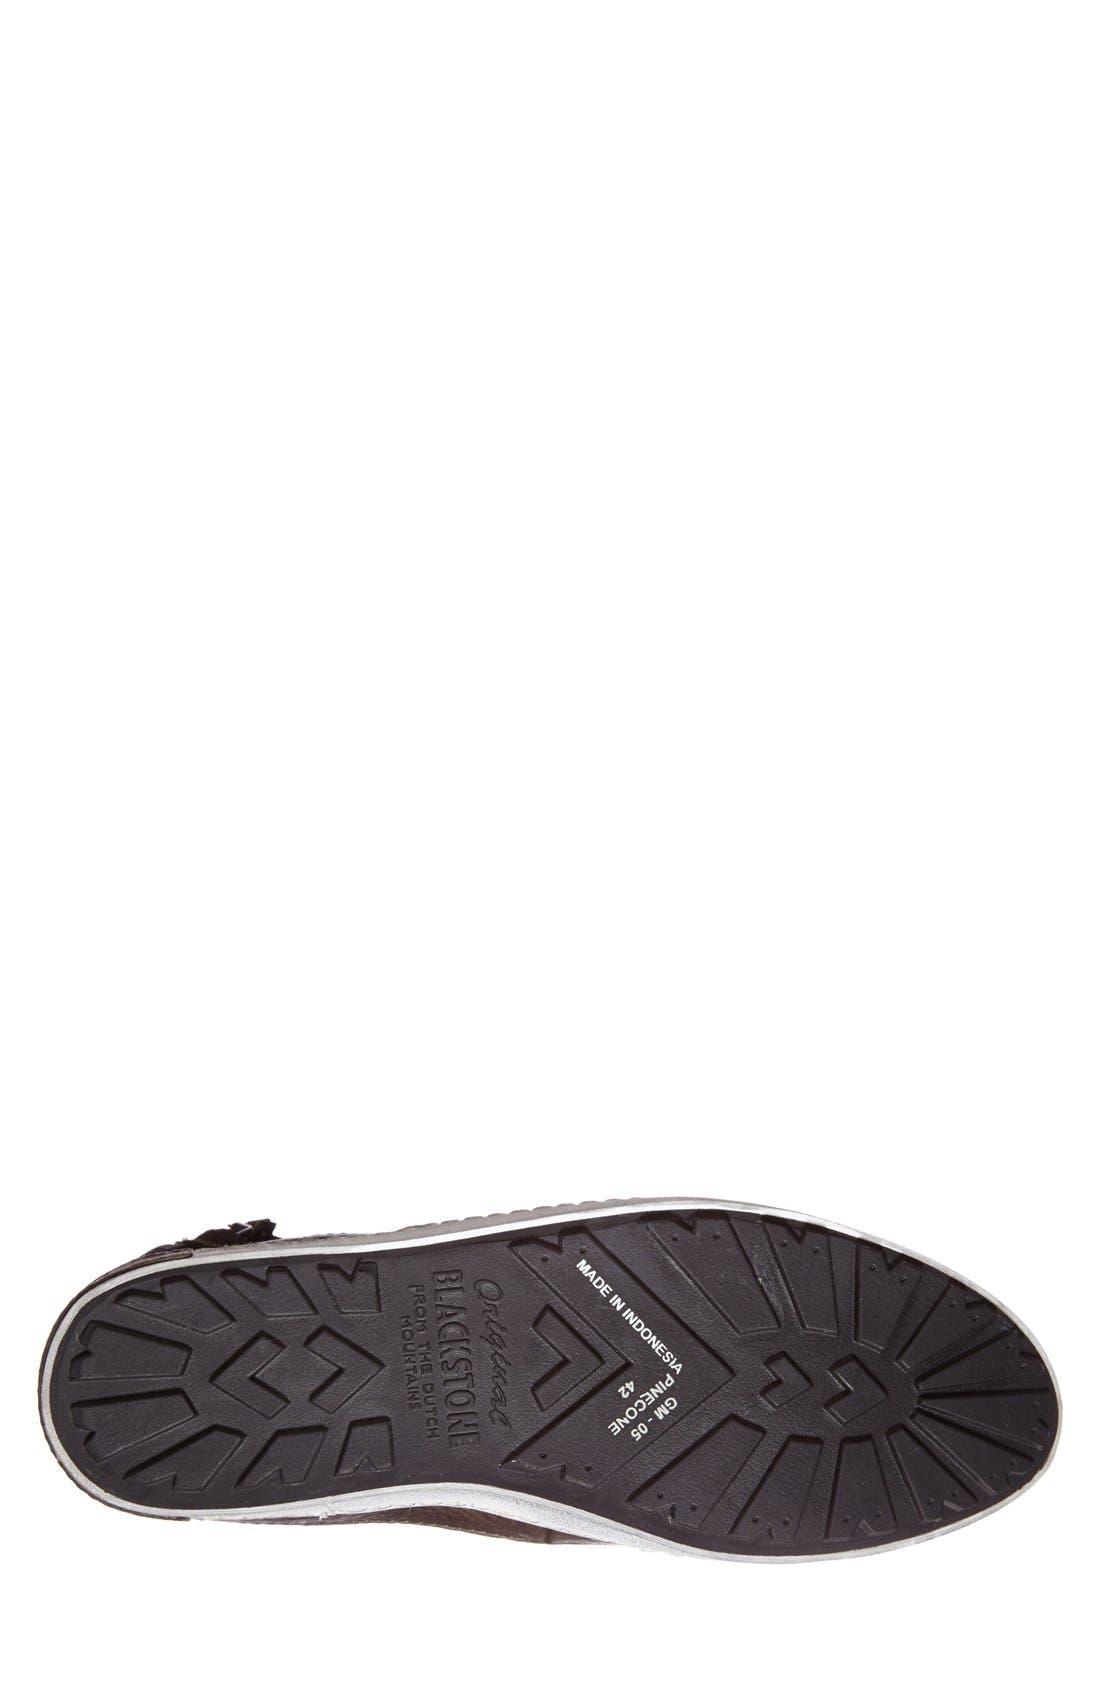 'GM05' High Top Sneaker,                             Alternate thumbnail 4, color,                             PINECONE